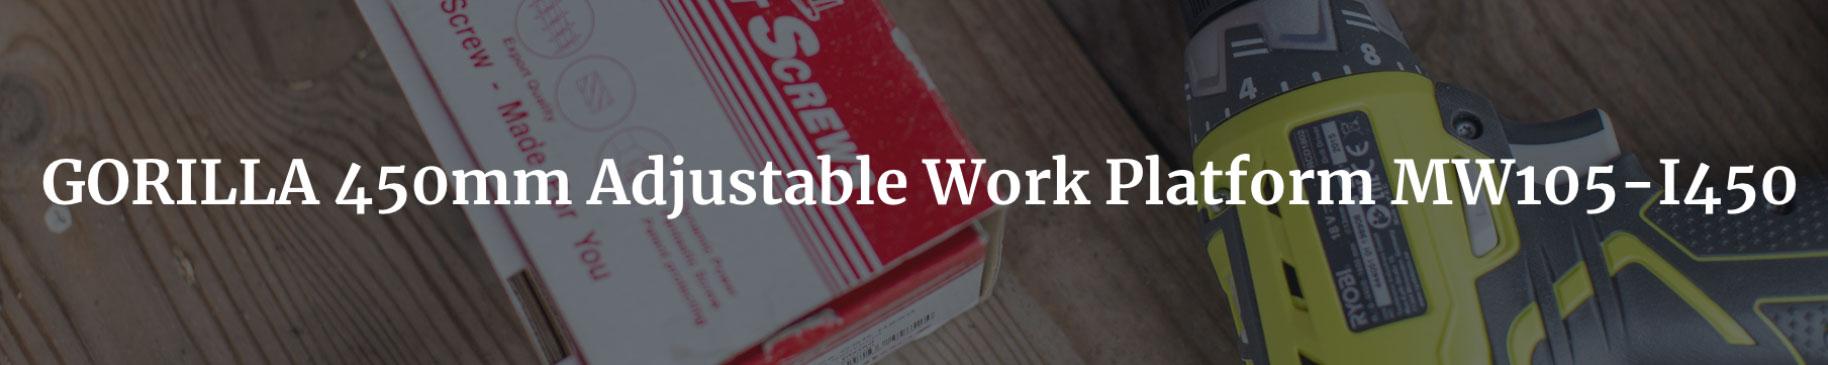 gorilla 450mm adjustable work platform mw105 I450 headers